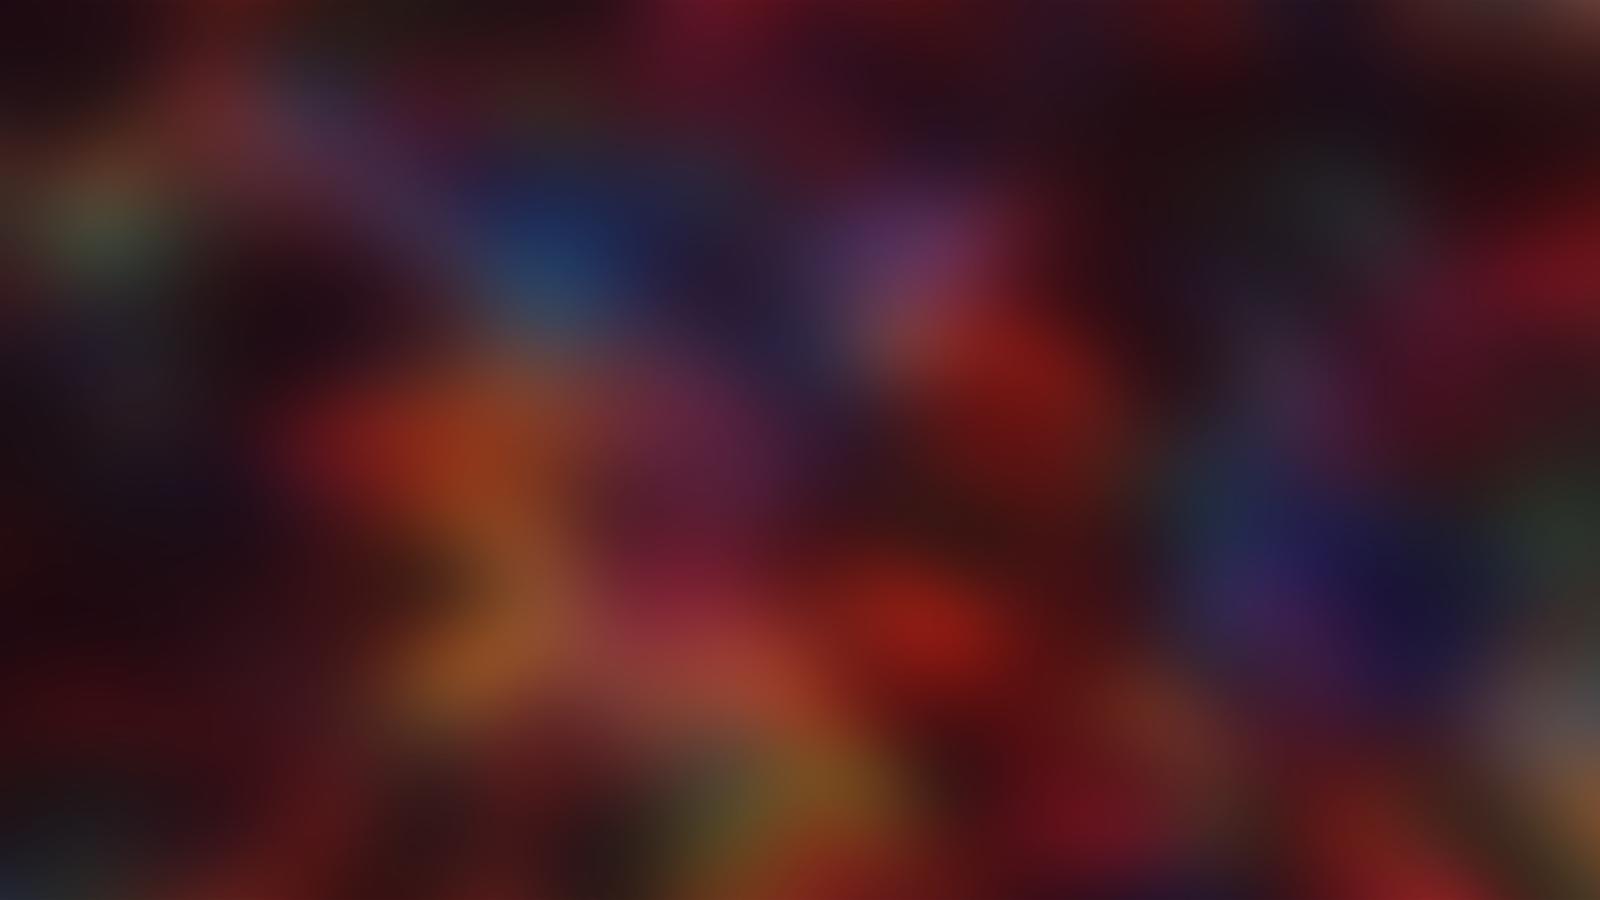 1080P Minimalist Wallpaper - WallpaperSafari